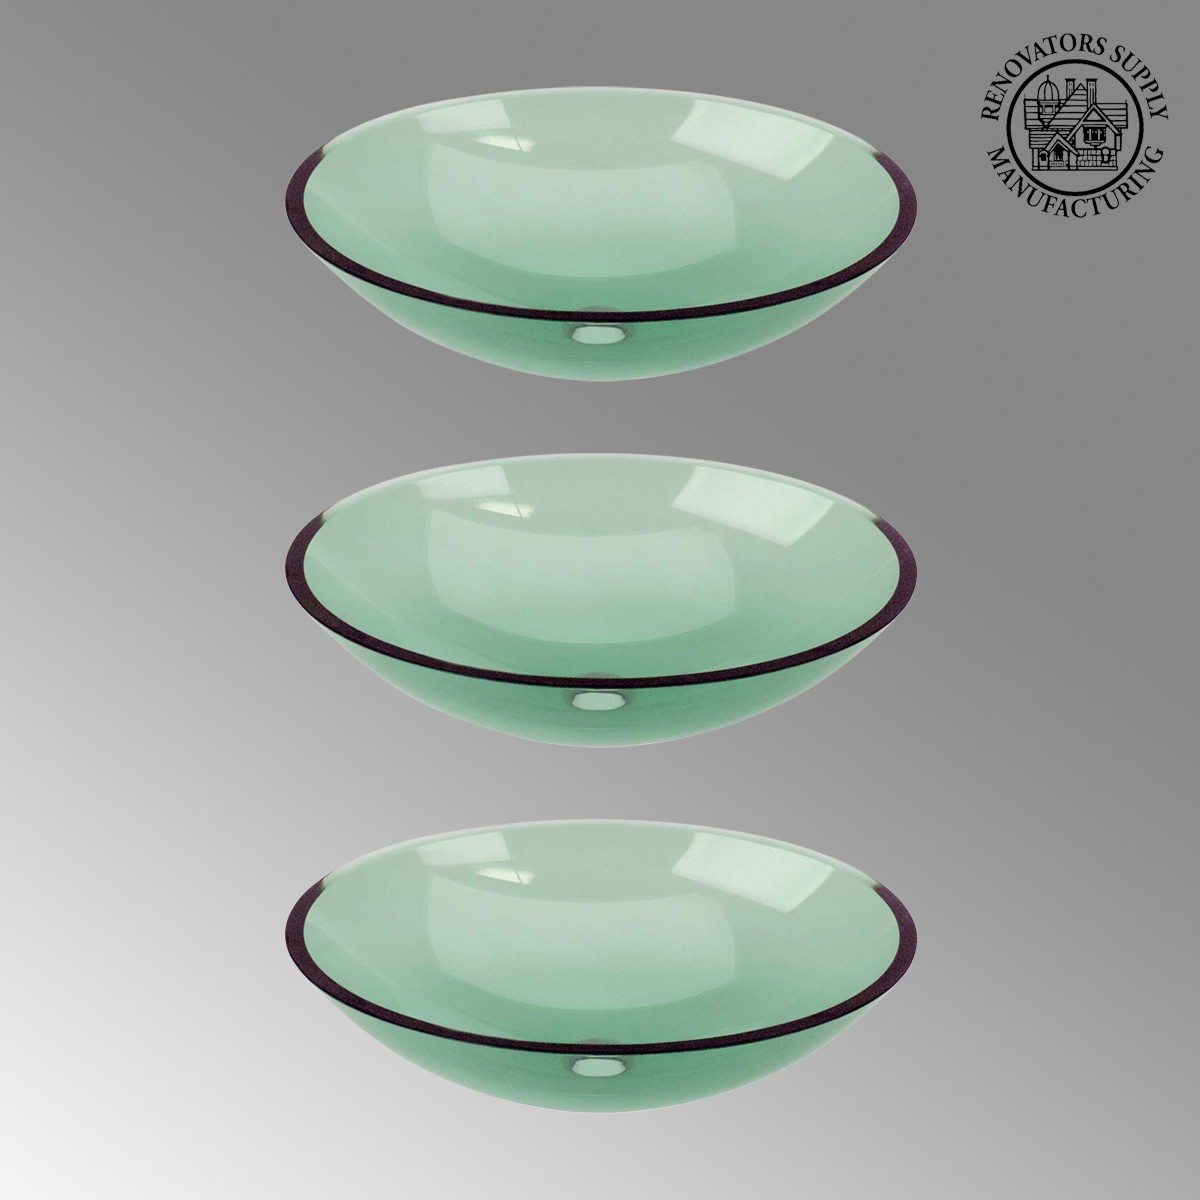 3 green glass vessel bathroom oval sink pop up in - Green glass vessel bathroom sinks ...